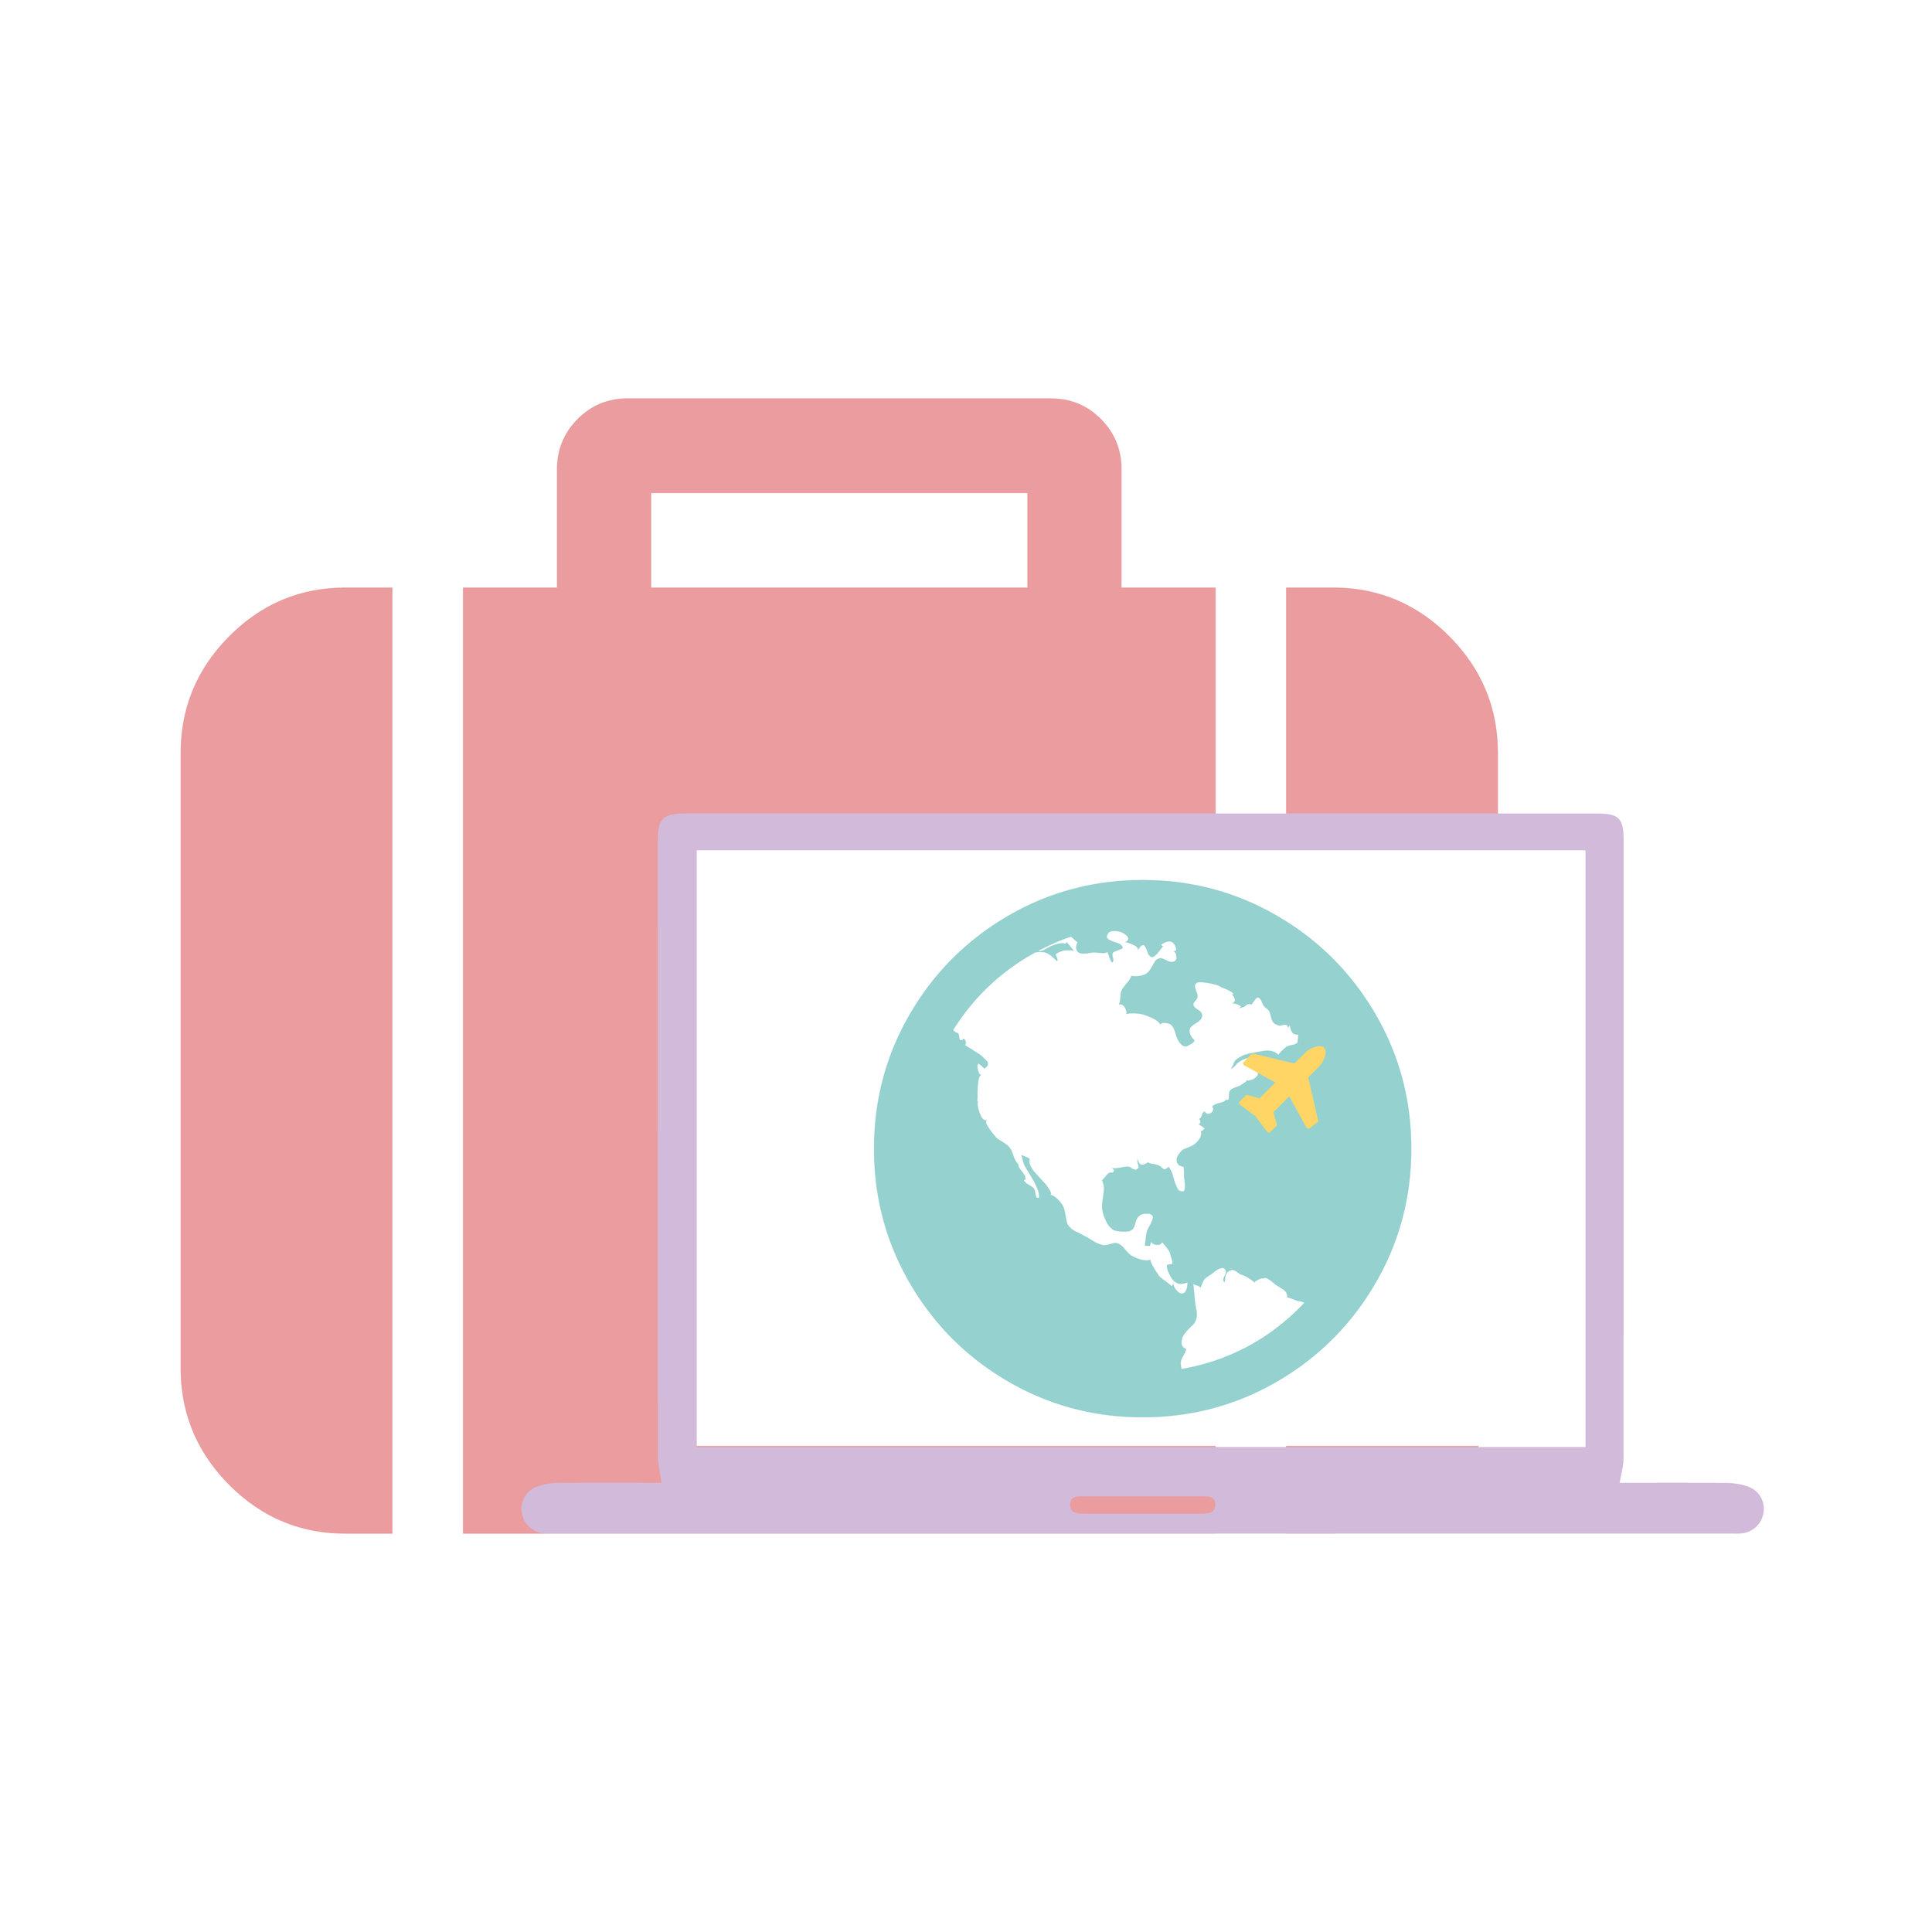 homepage-travel-guide-icon.jpg